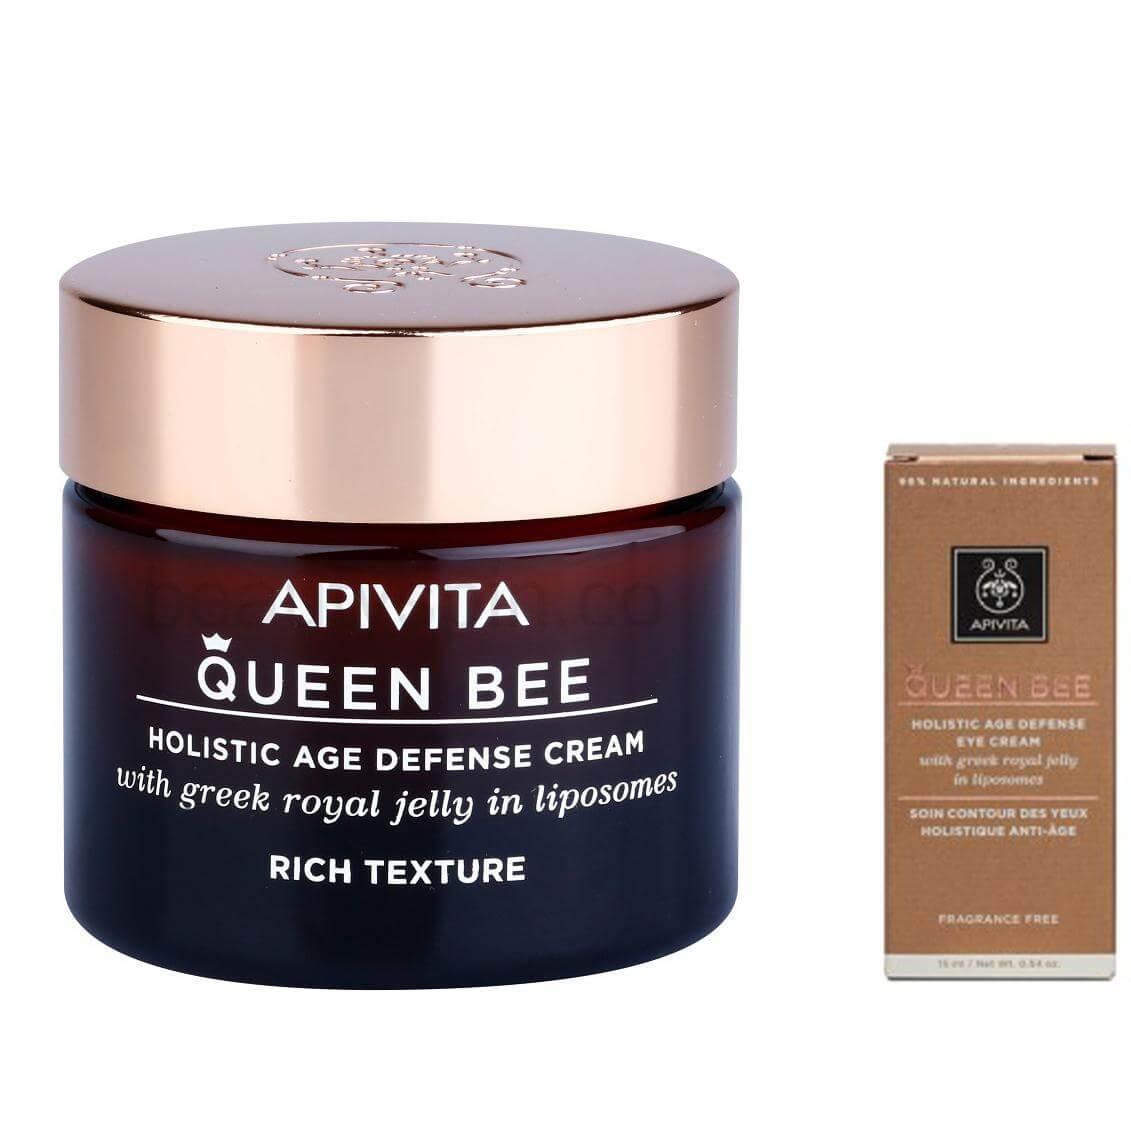 Apivita Πακέτο Προσφοράς Queen Bee Rich Cream Kρέμα Ημέρας Πλούσιας Υφής 50ml &  σετ   εκπτώσεις νοεμβρίου 2016